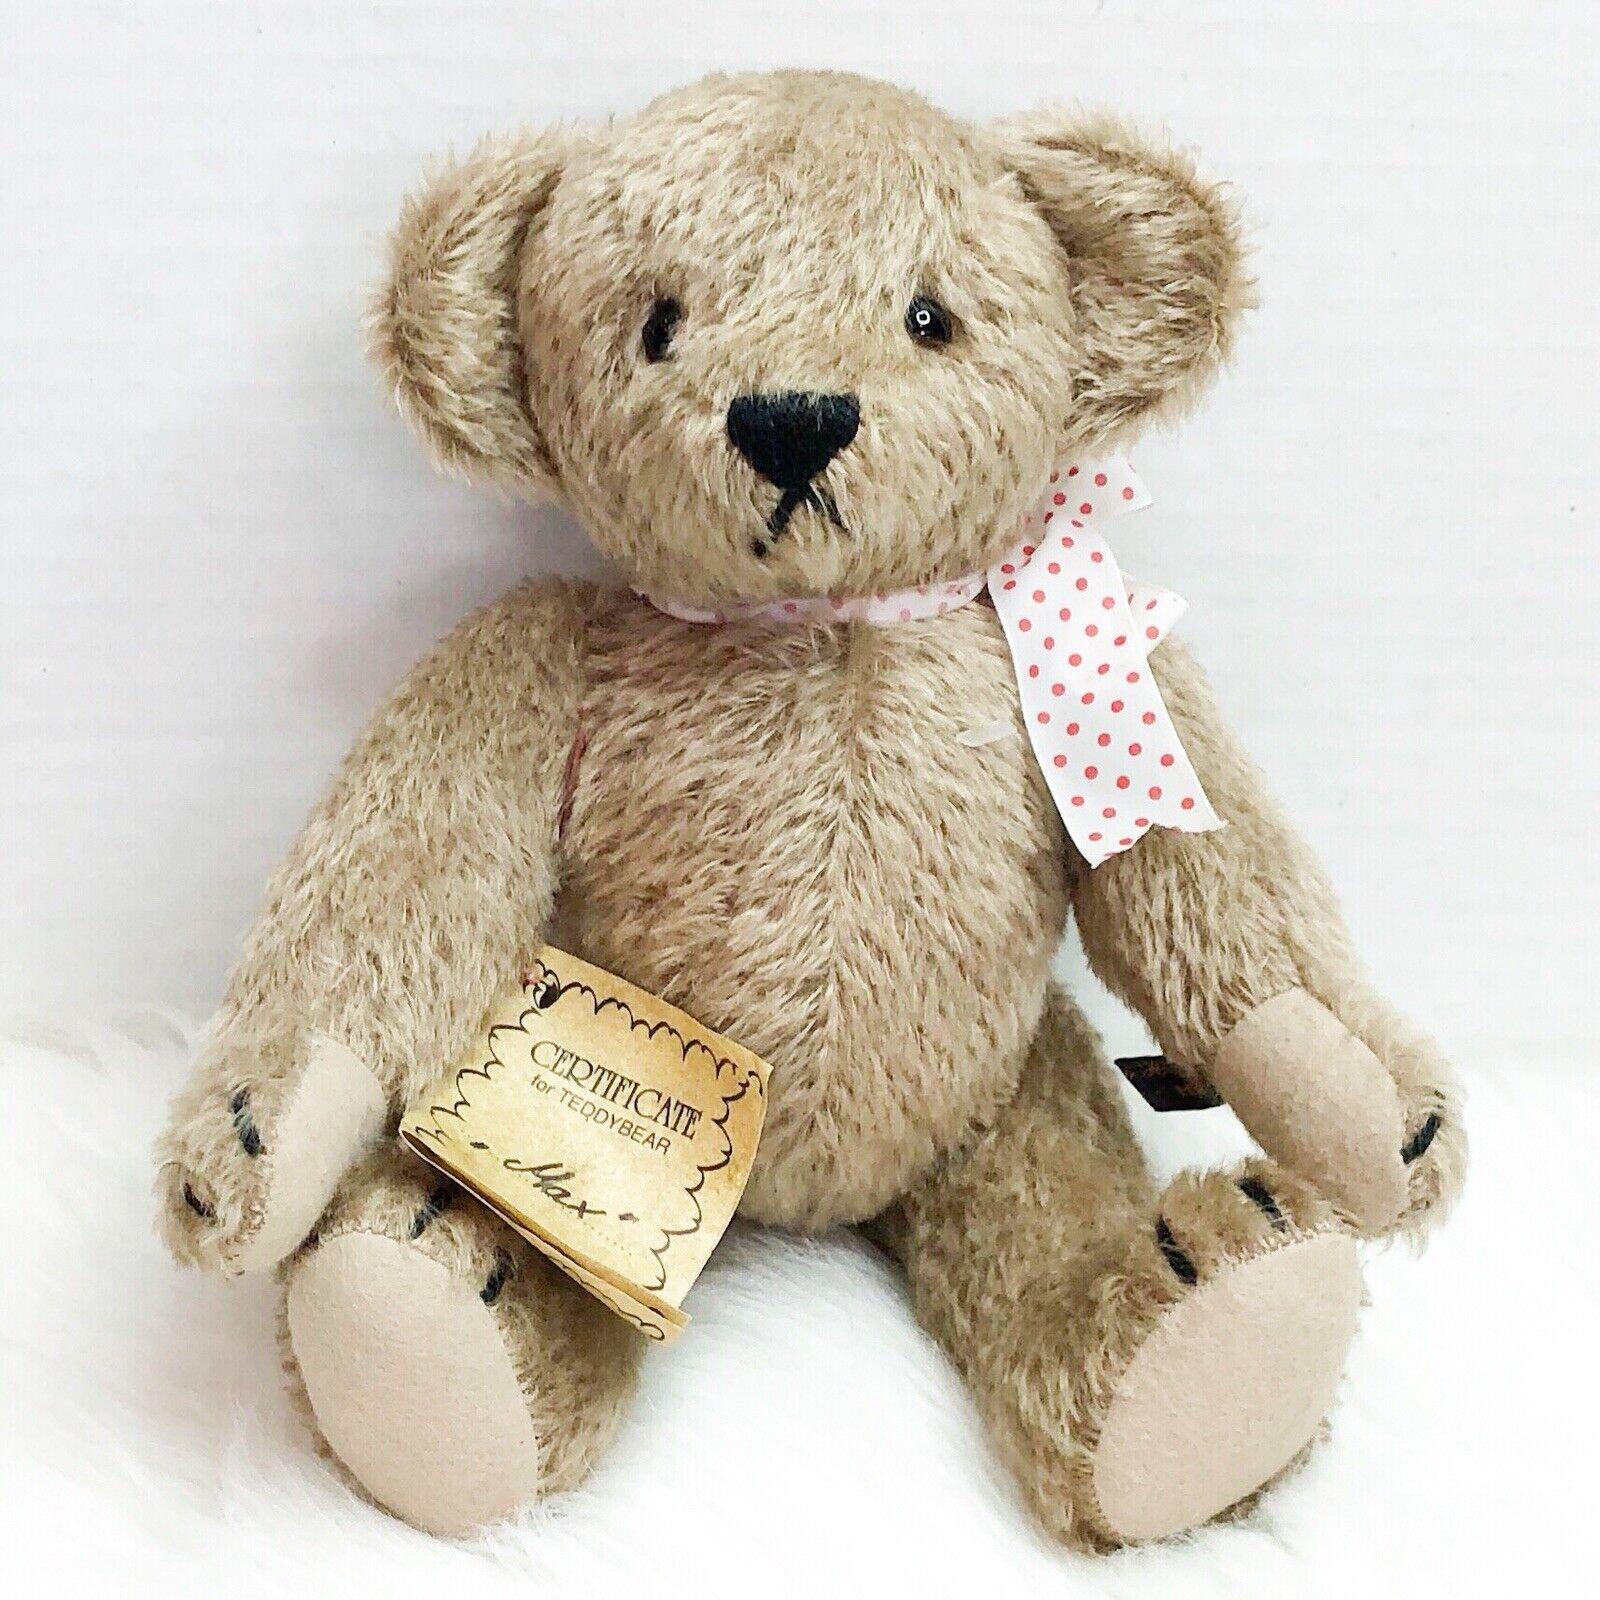 Vintage Johanna Haida Max Handcrafted Mohair Teddy Bear Made in Germany 1994